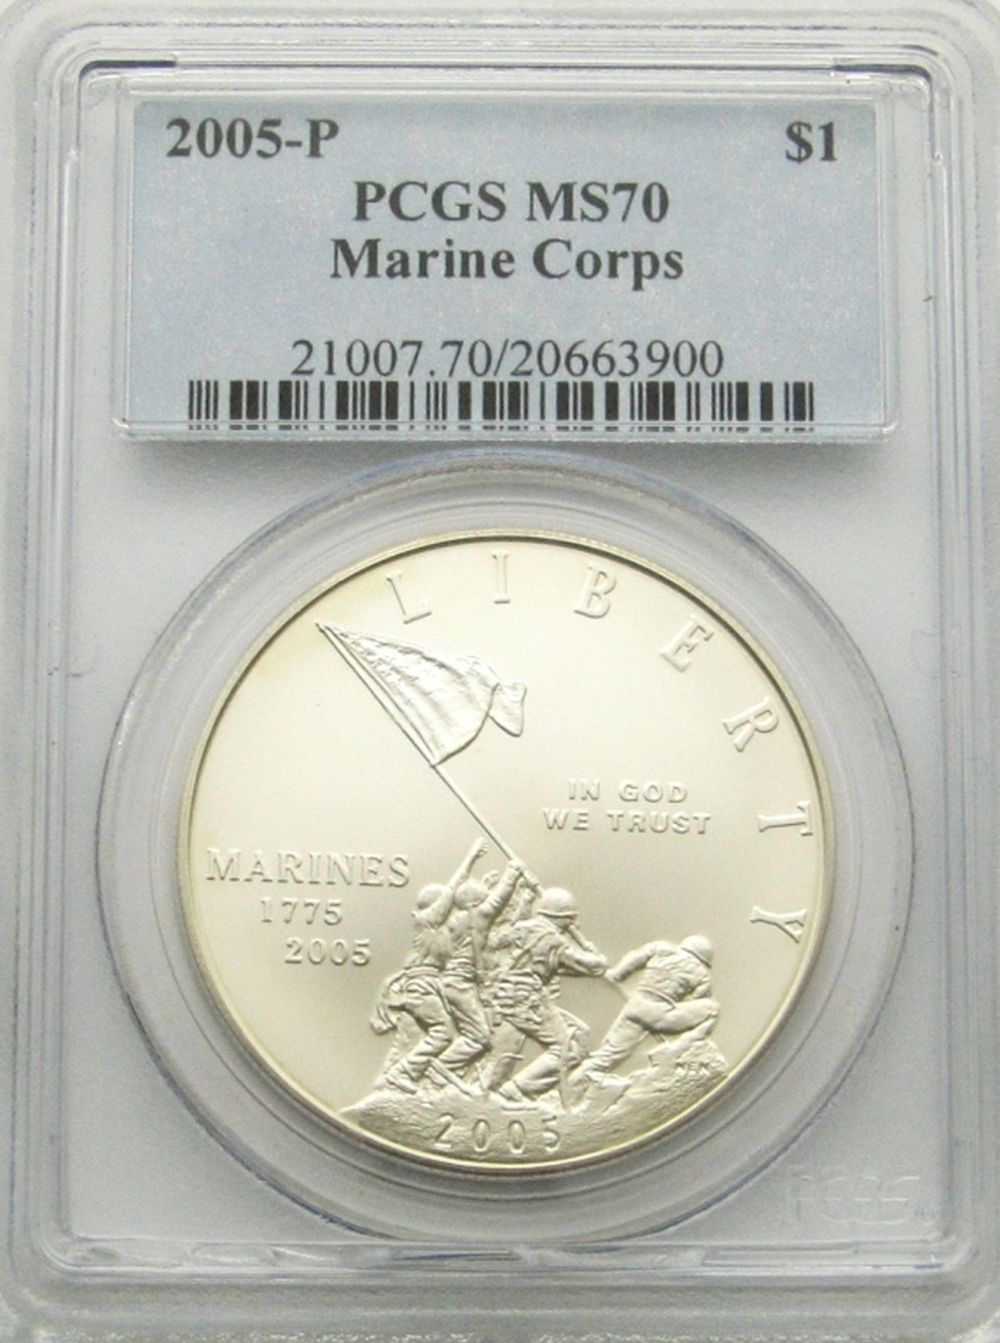 2005-P MARINE CORPS SILVER DOLLAR PCGS